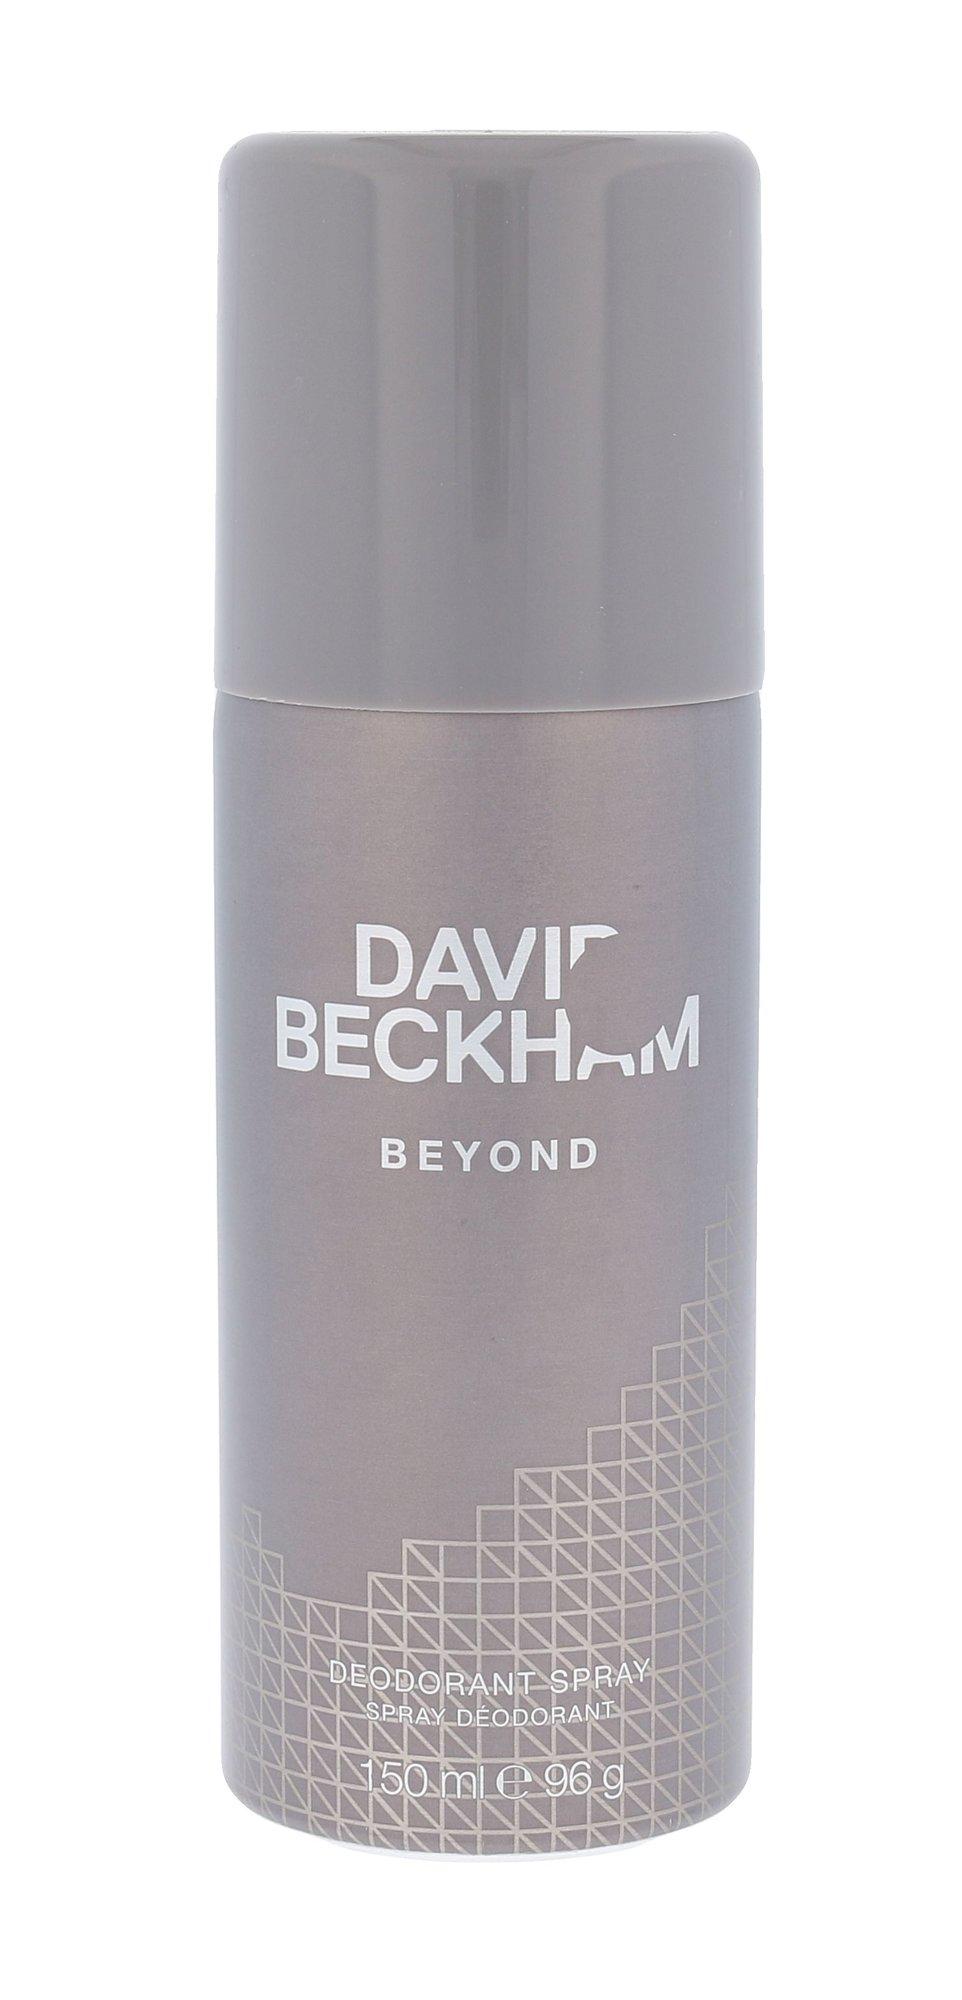 Dezodorantas David Beckham Beyond